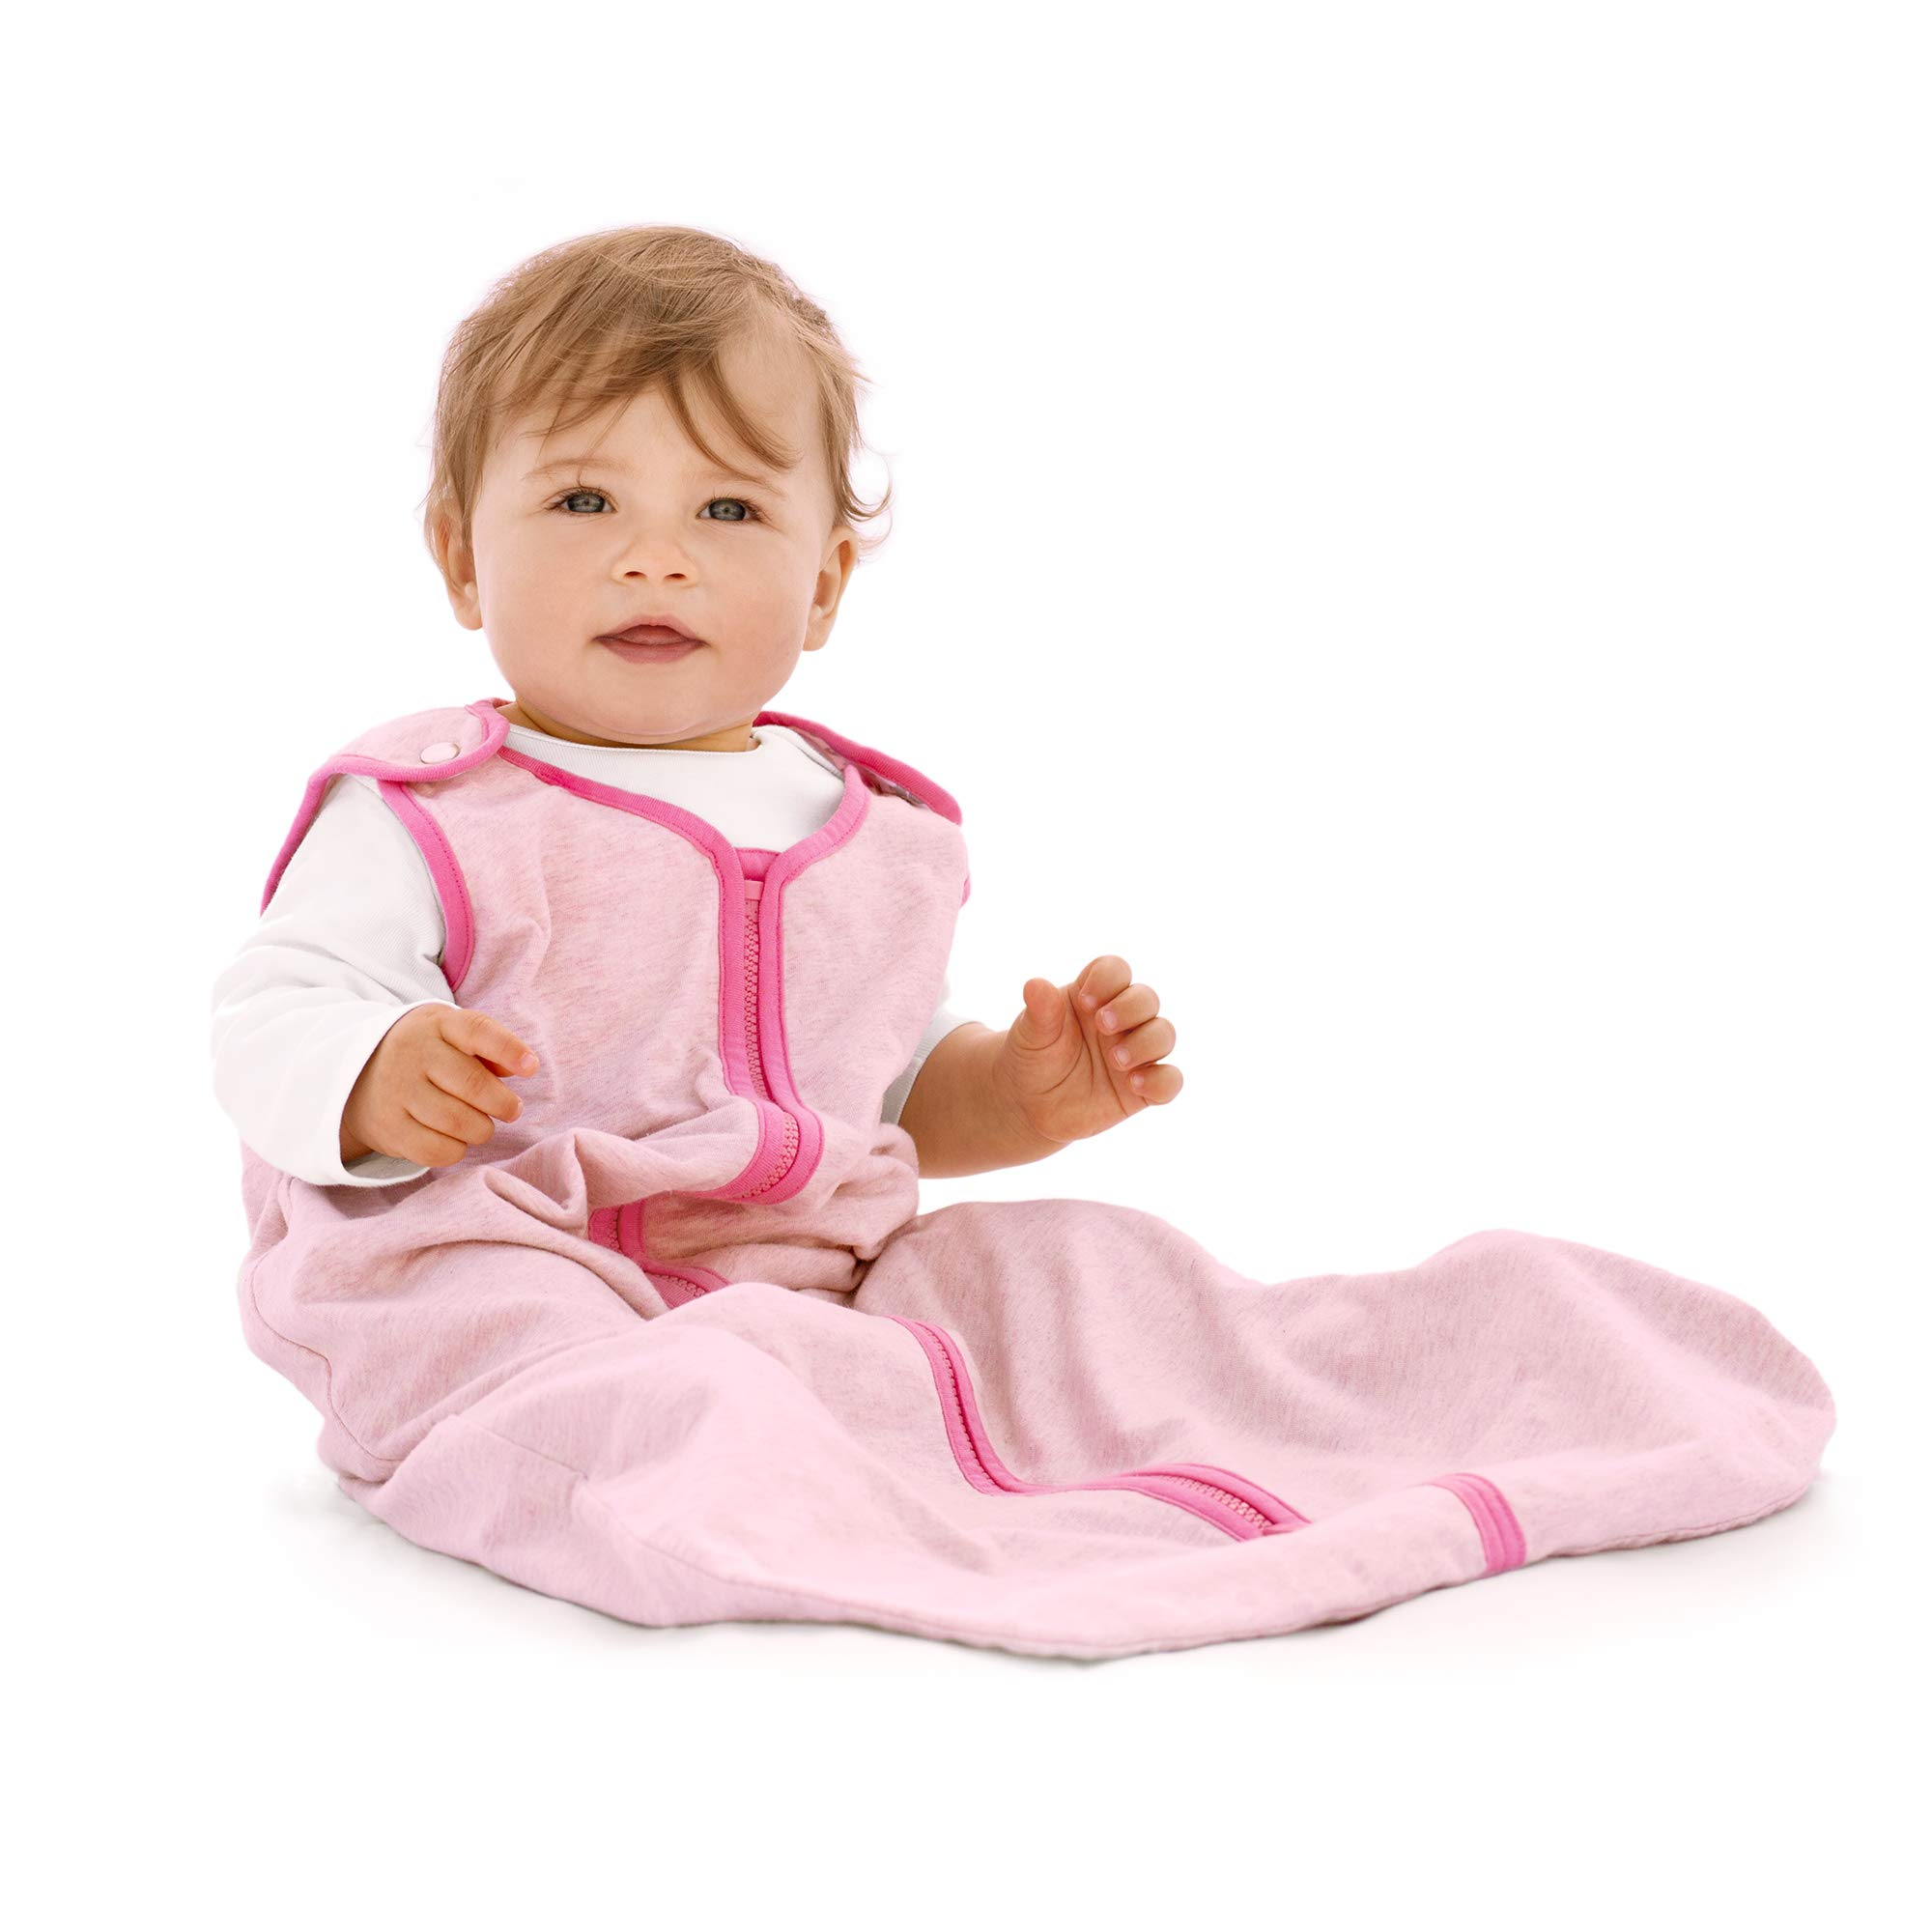 baby deedee Sleep Nest Lite Sleeping Bag Sack, Heather Pink, Large (18-36 Months)